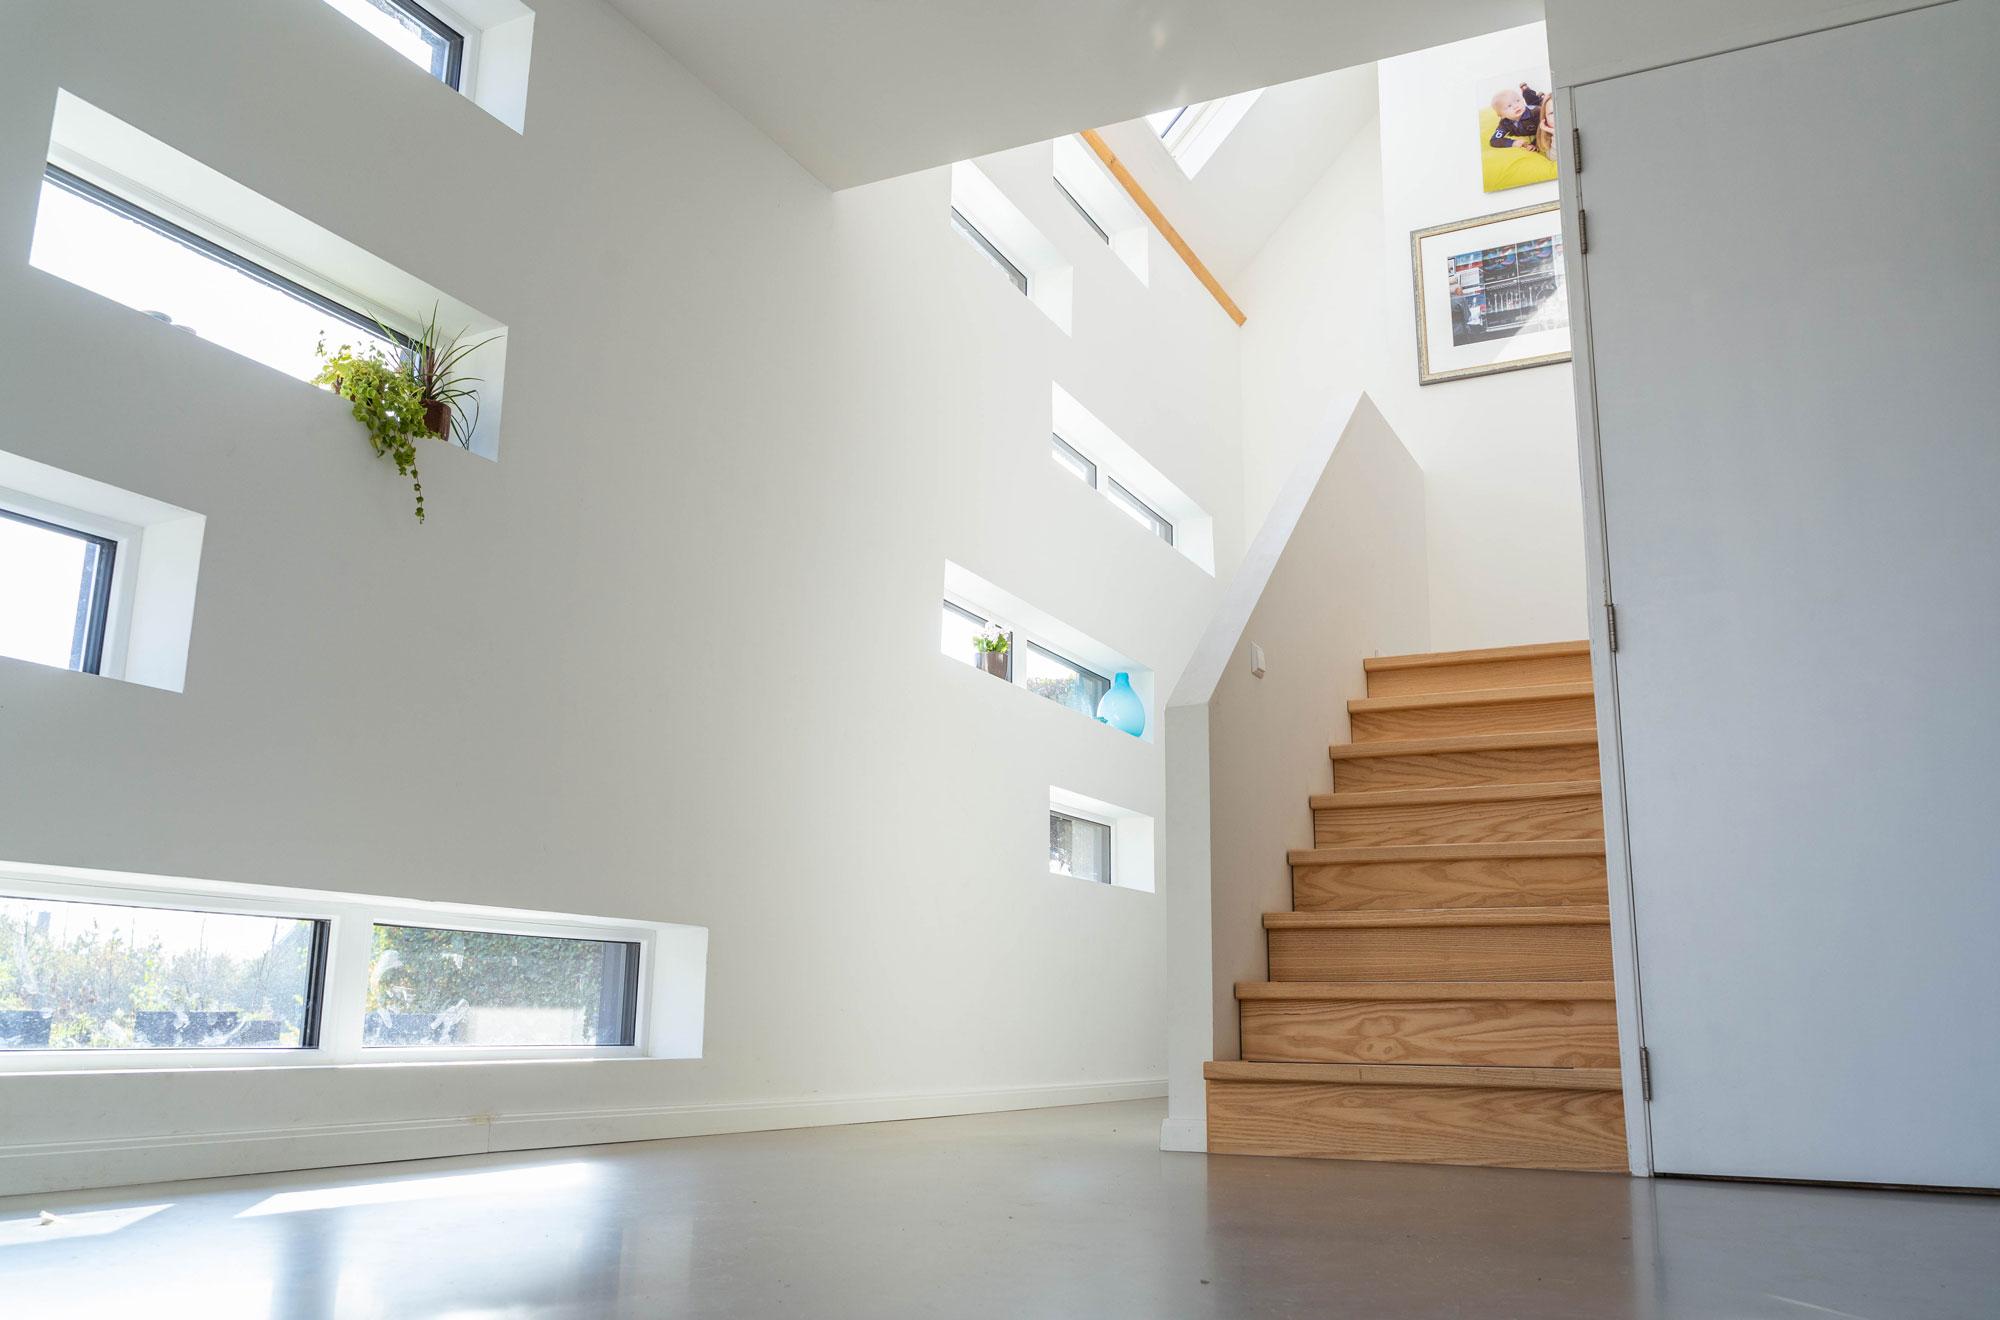 dijkstra trapper hout eiken trappen ambachtelijke trappen